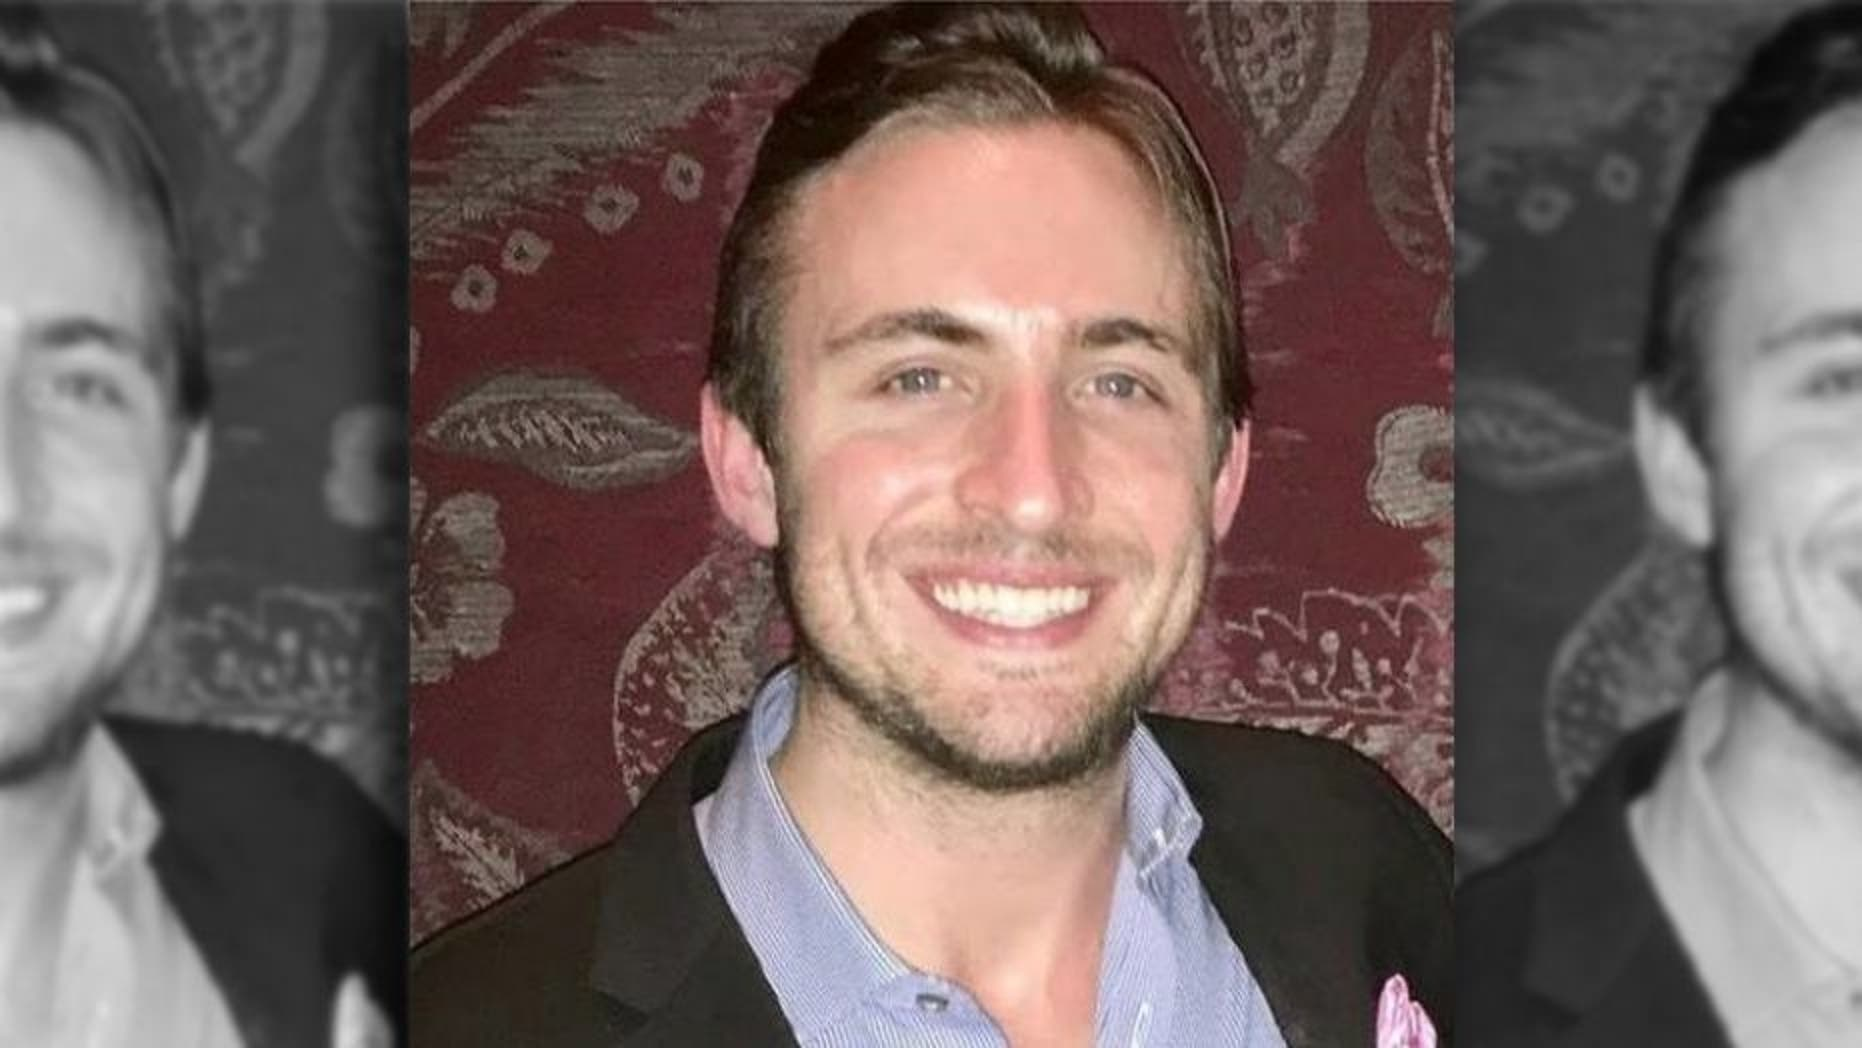 Joshua Thiede, 29, was last seen Feb. 11 leaving his apartment garage during a trip for Lyft, police said.